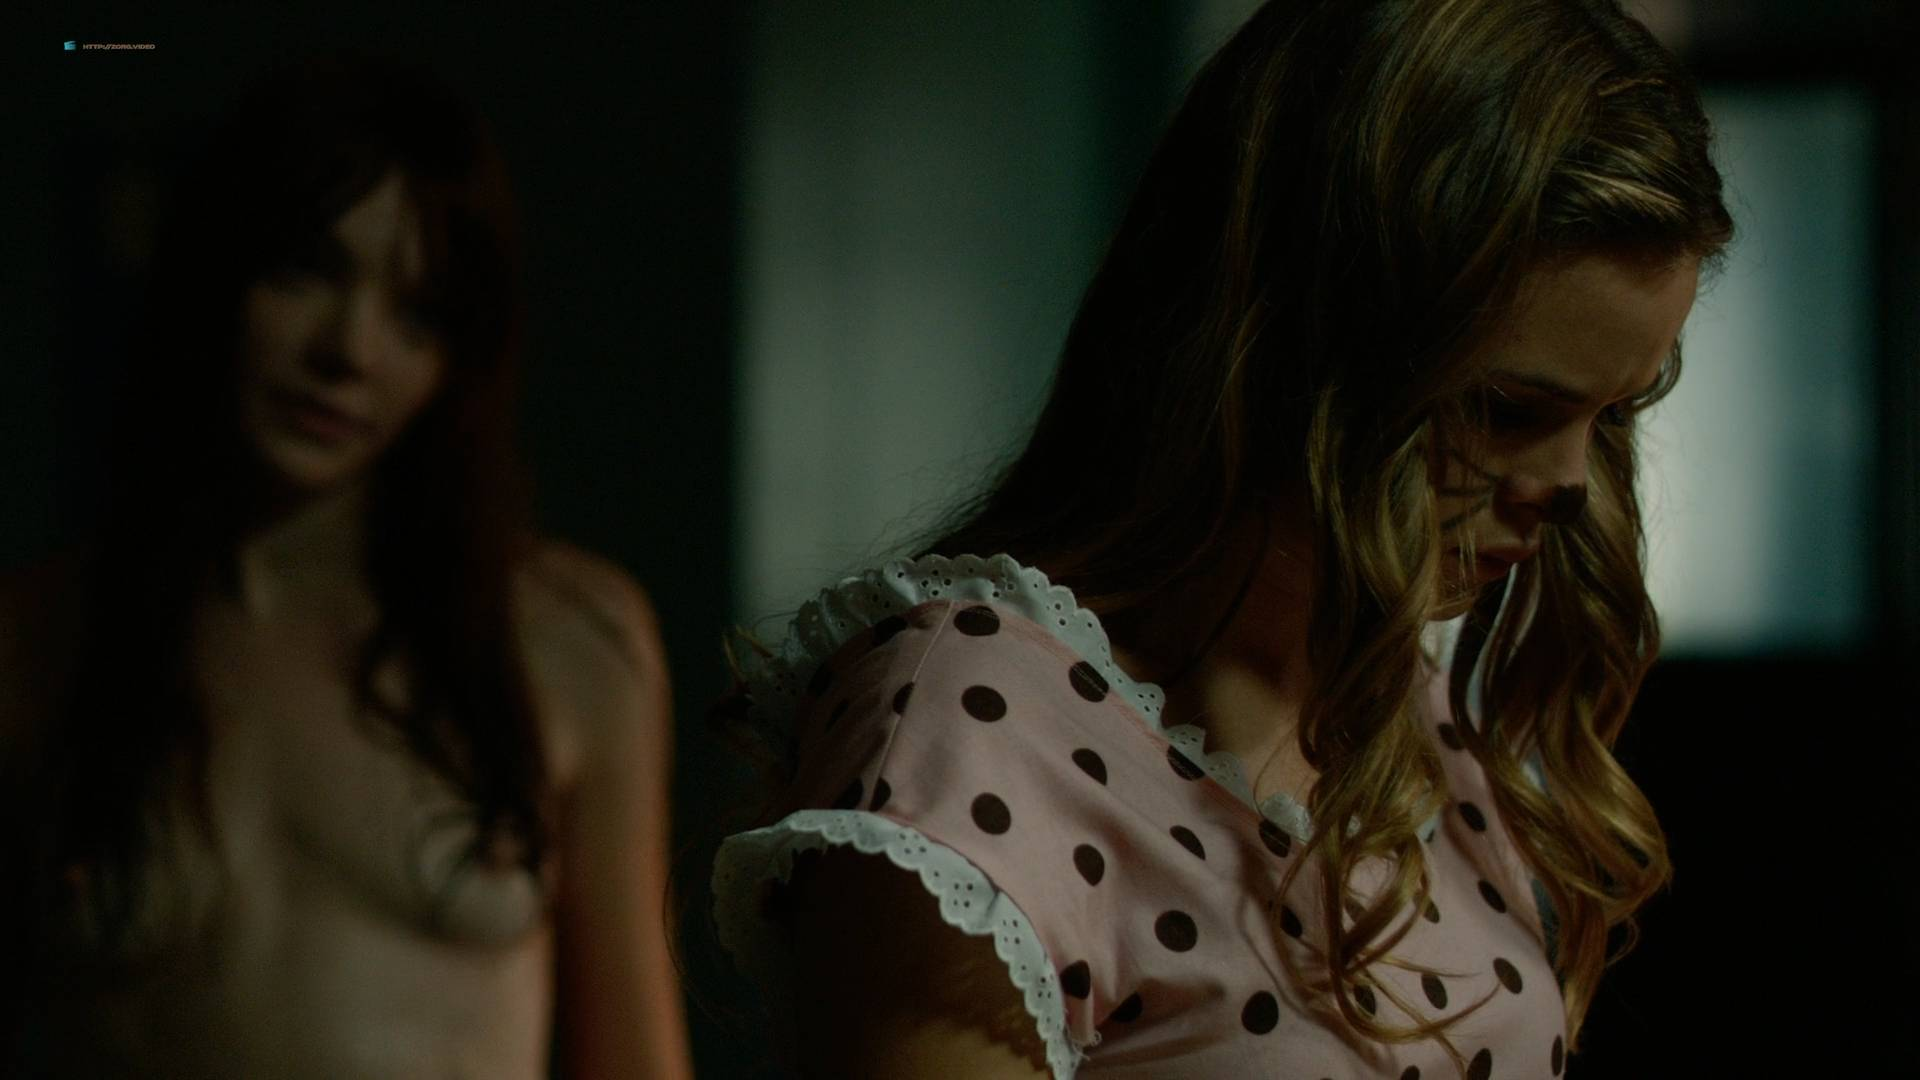 Nicole LaLiberte nude full frontal - Girls Against Boys (2013) HD 1080p BluRay (7)